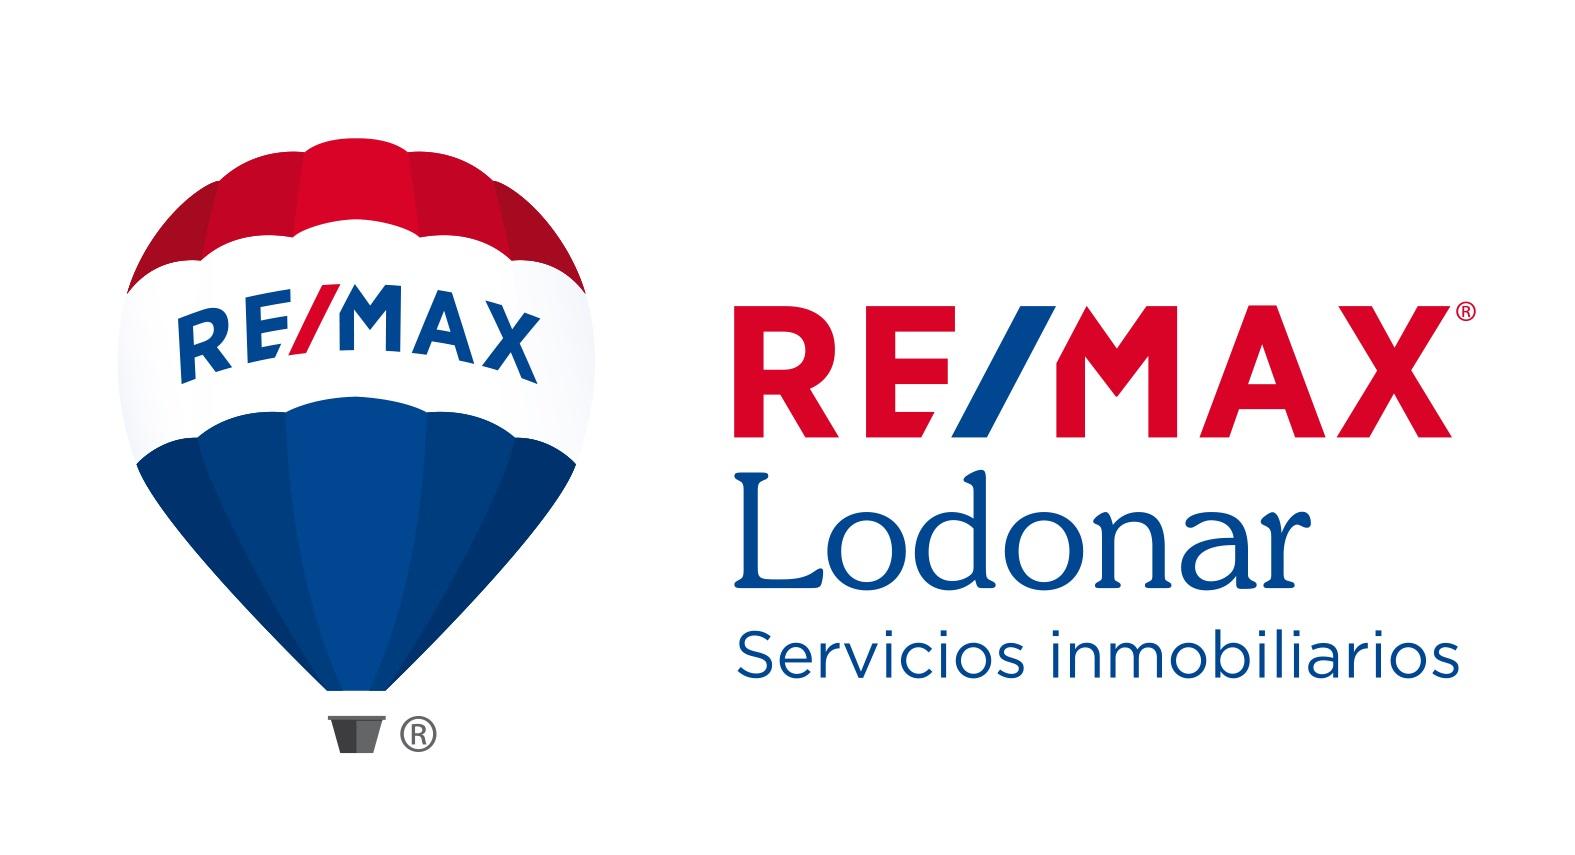 REMAX LODONAR